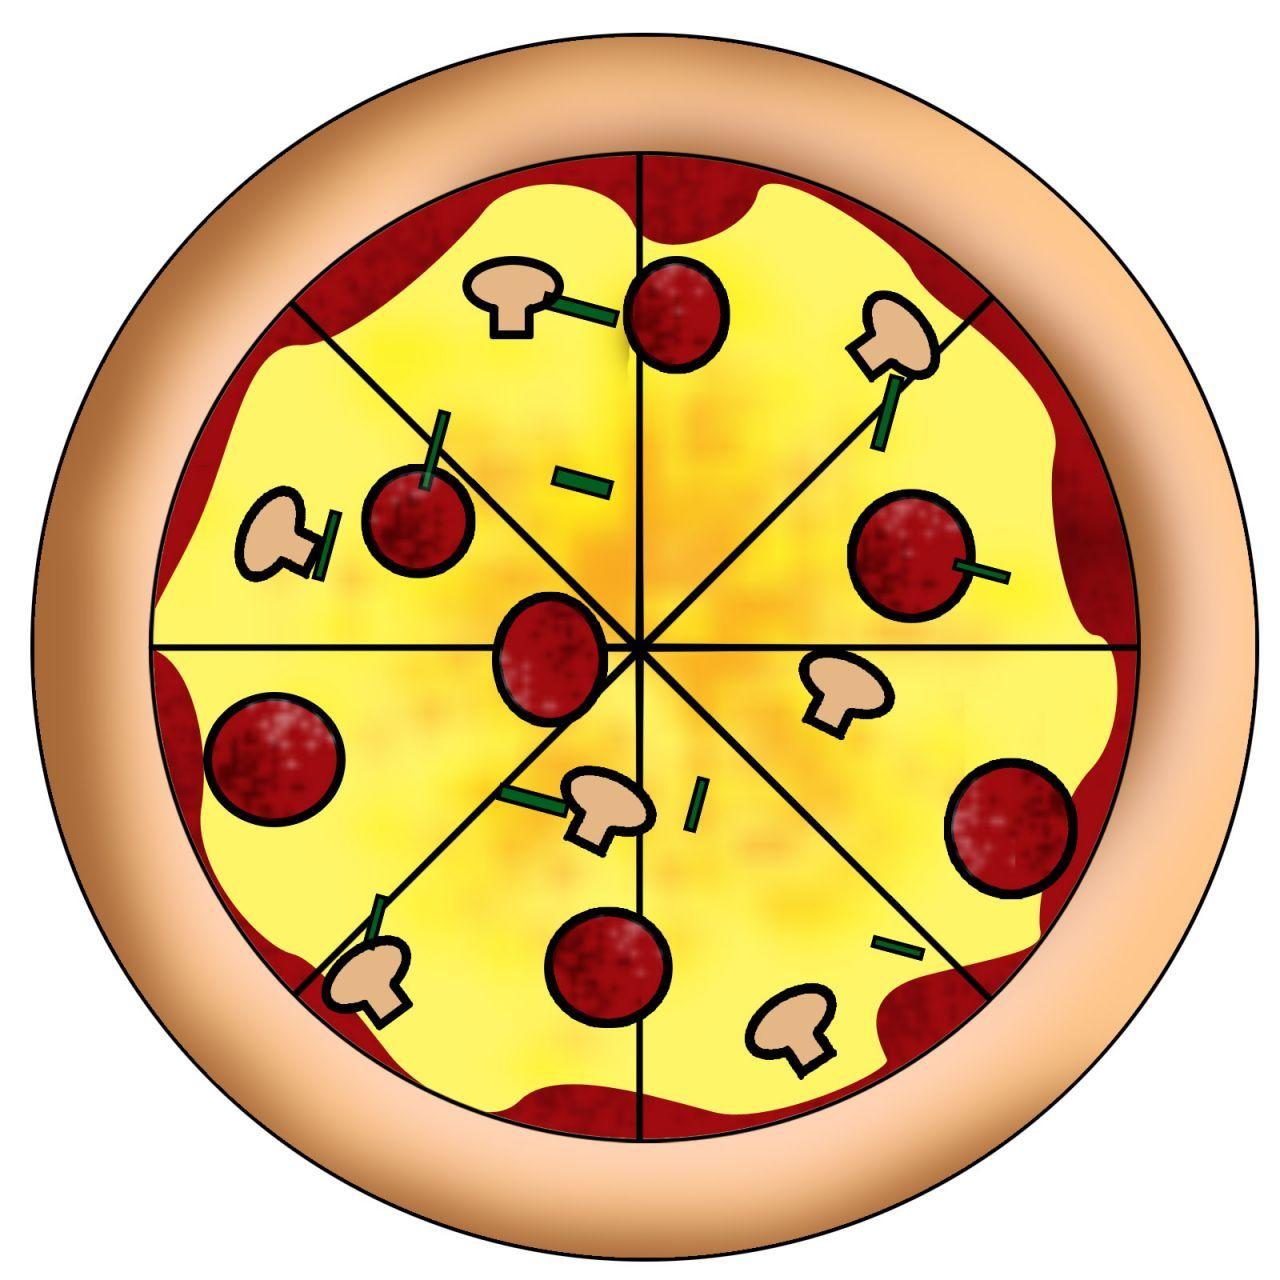 1280x1280 Pizza Pie Clip Art Clipart Panda